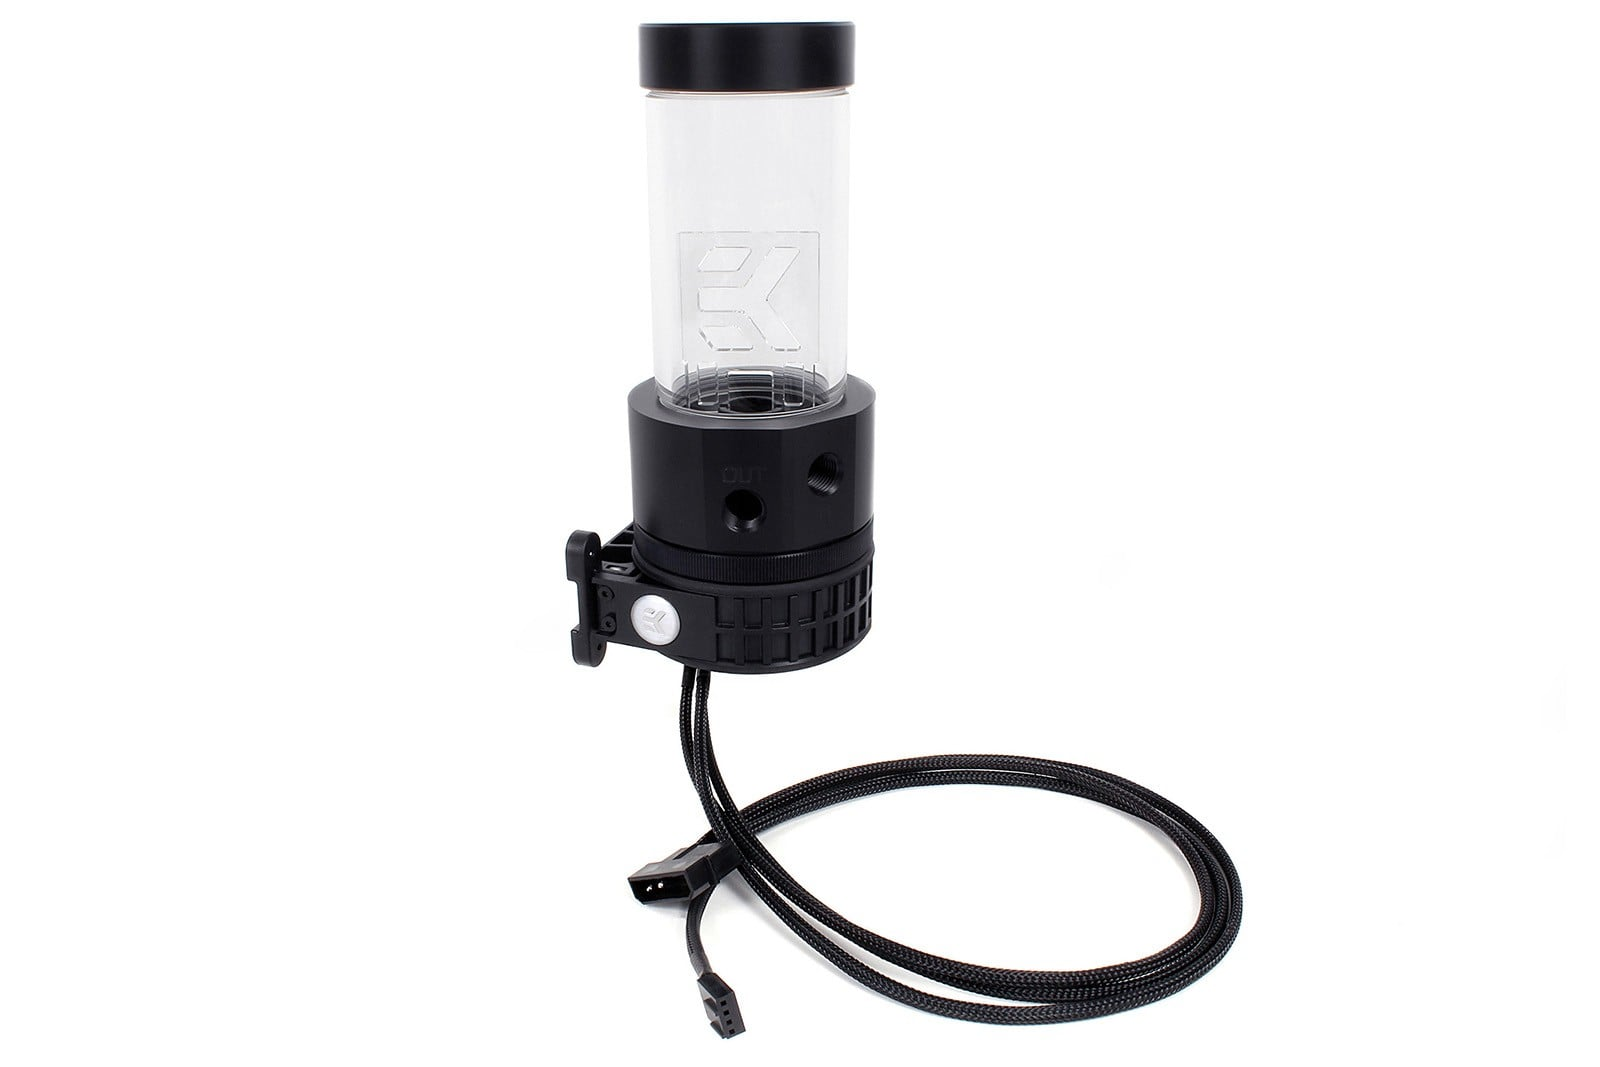 EK-XRES 140 Revo D5 PWM (incl pump) - sleeved